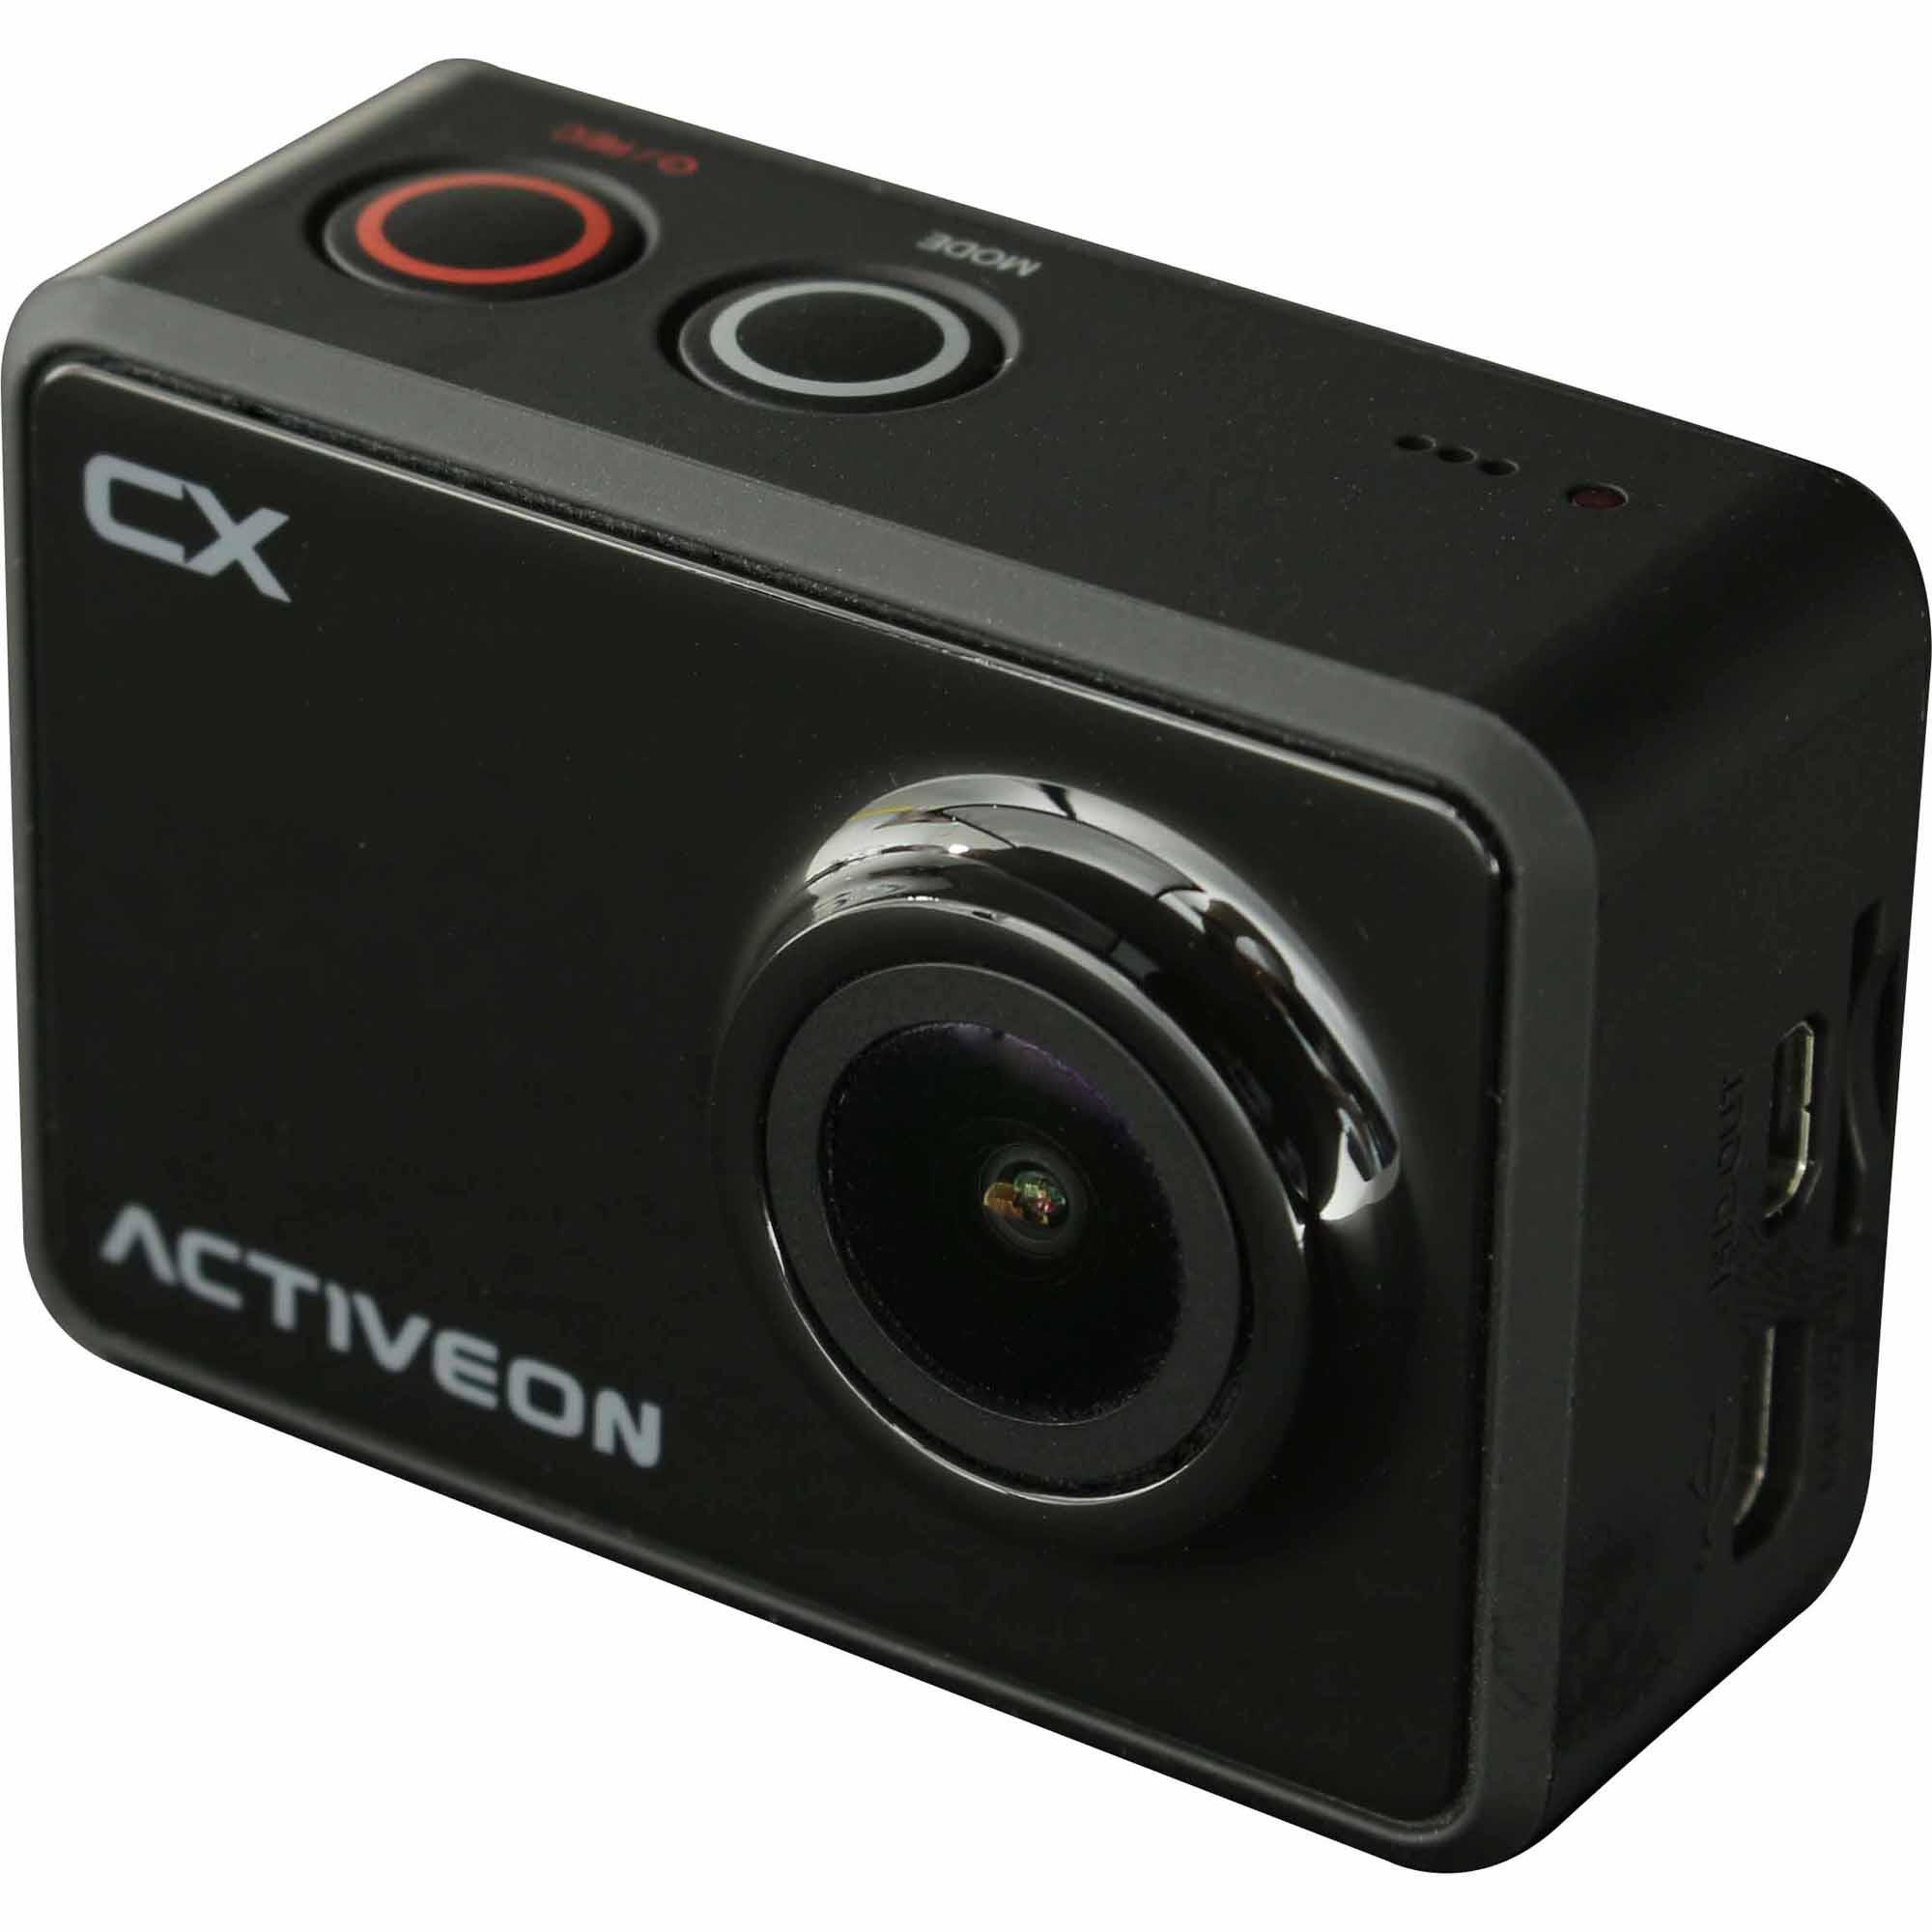 Activeon 5-Megapixel Action Cam CX w/ Built-In WiFi - Black